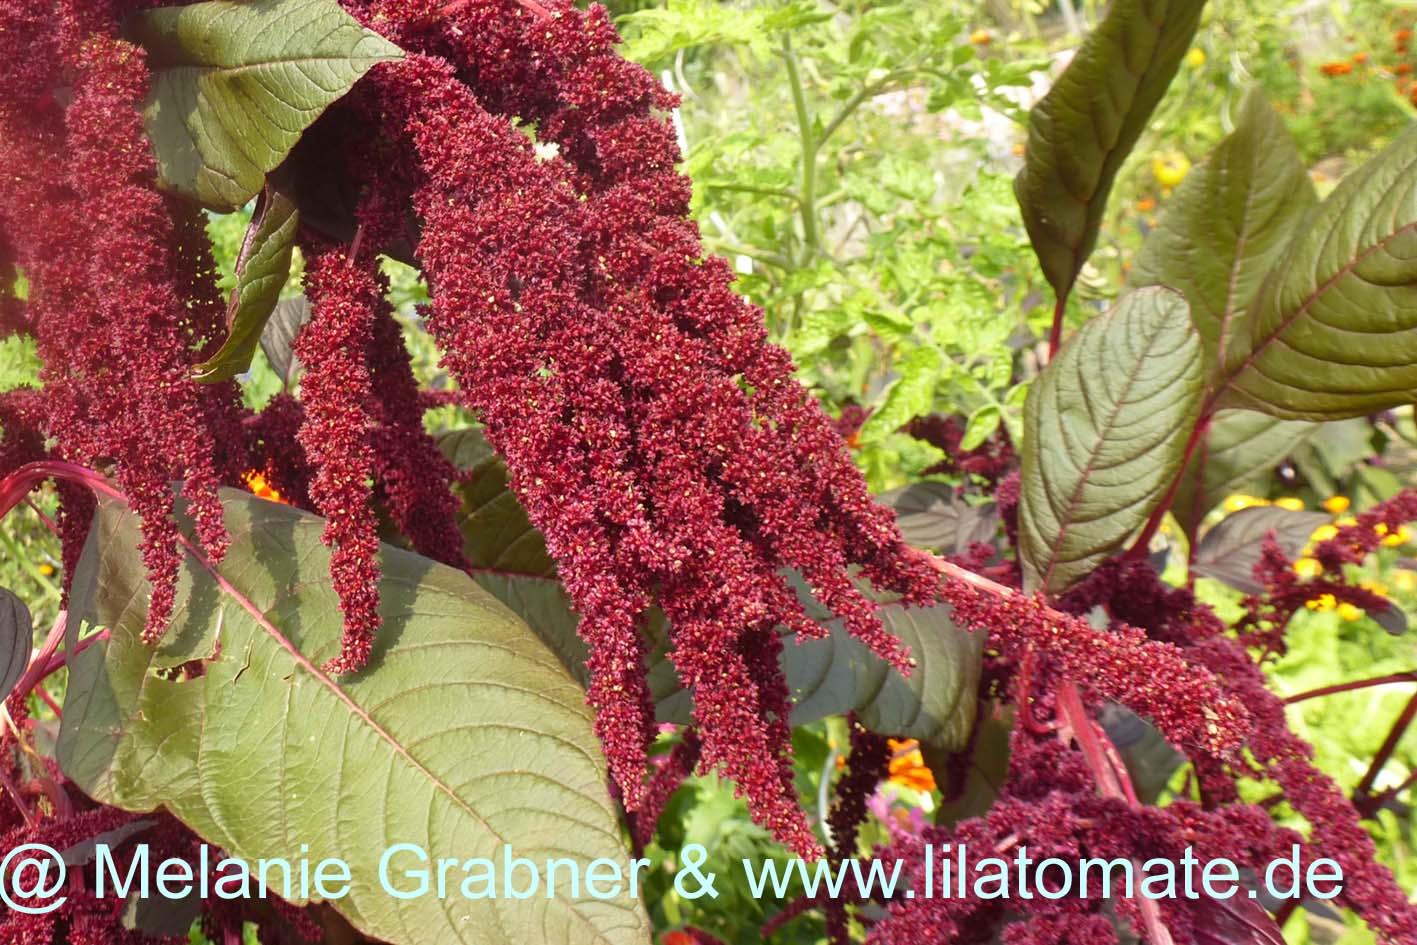 Blume Roter Amaranth Saatgut